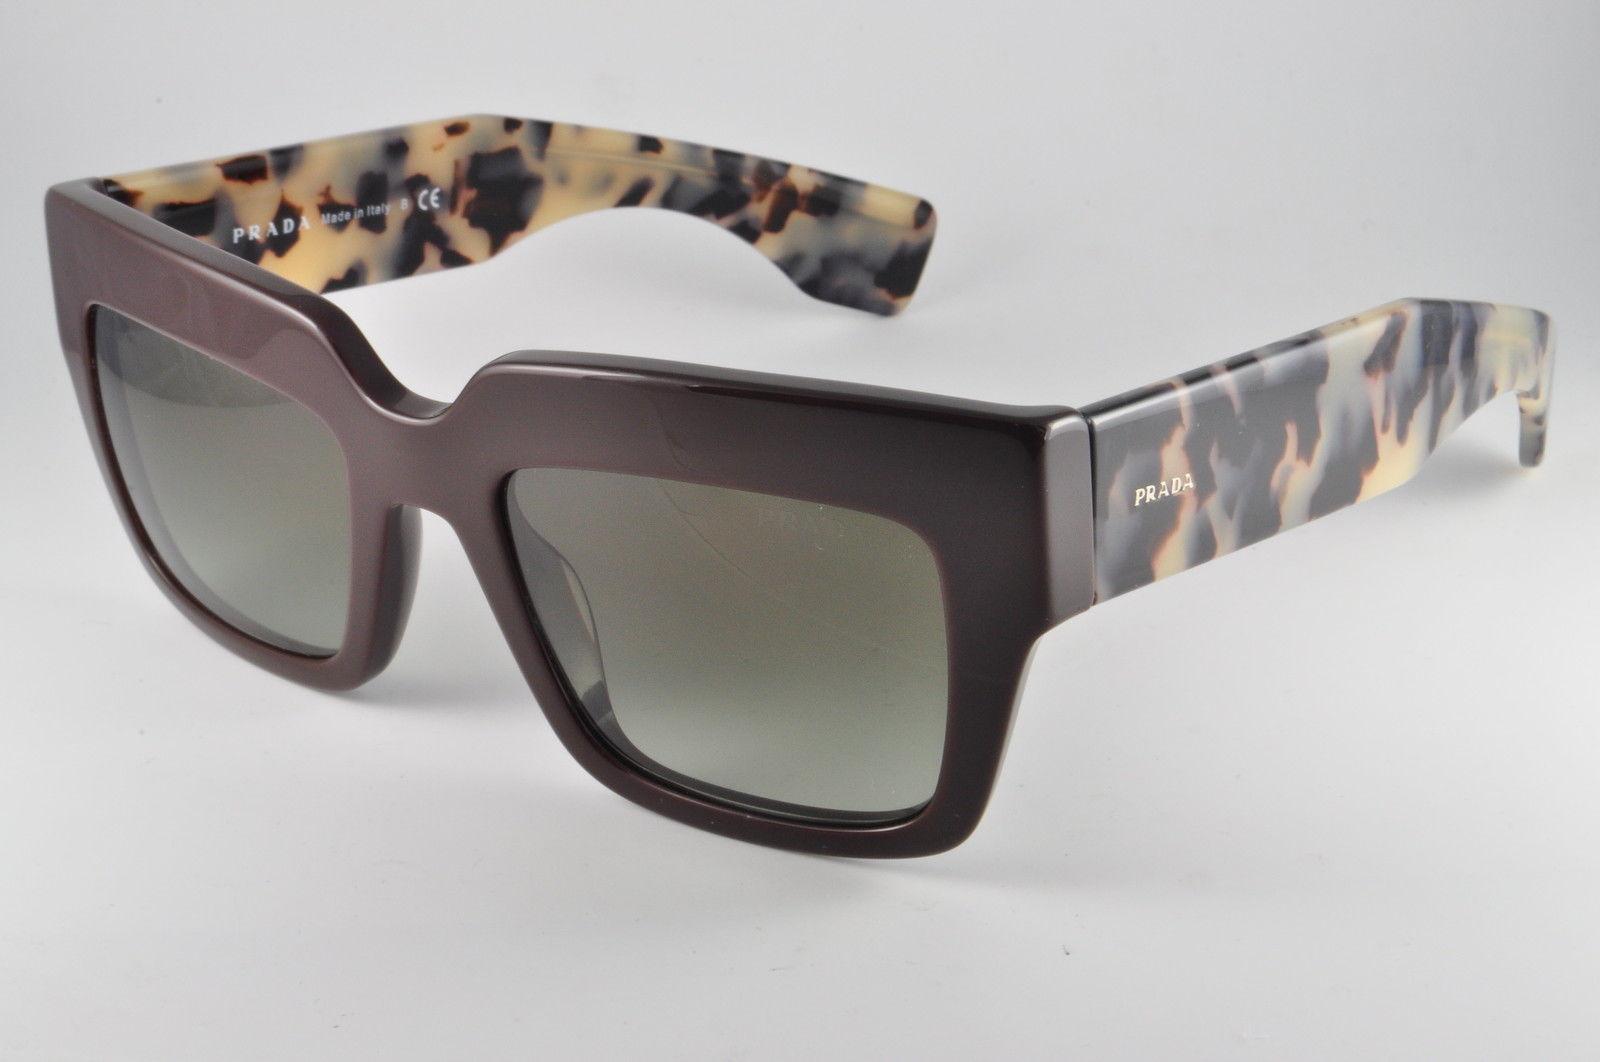 Prada Prada Designerware Sunglasses Sunglasses Designerware Prada Luxury Luxury MpqUVzS